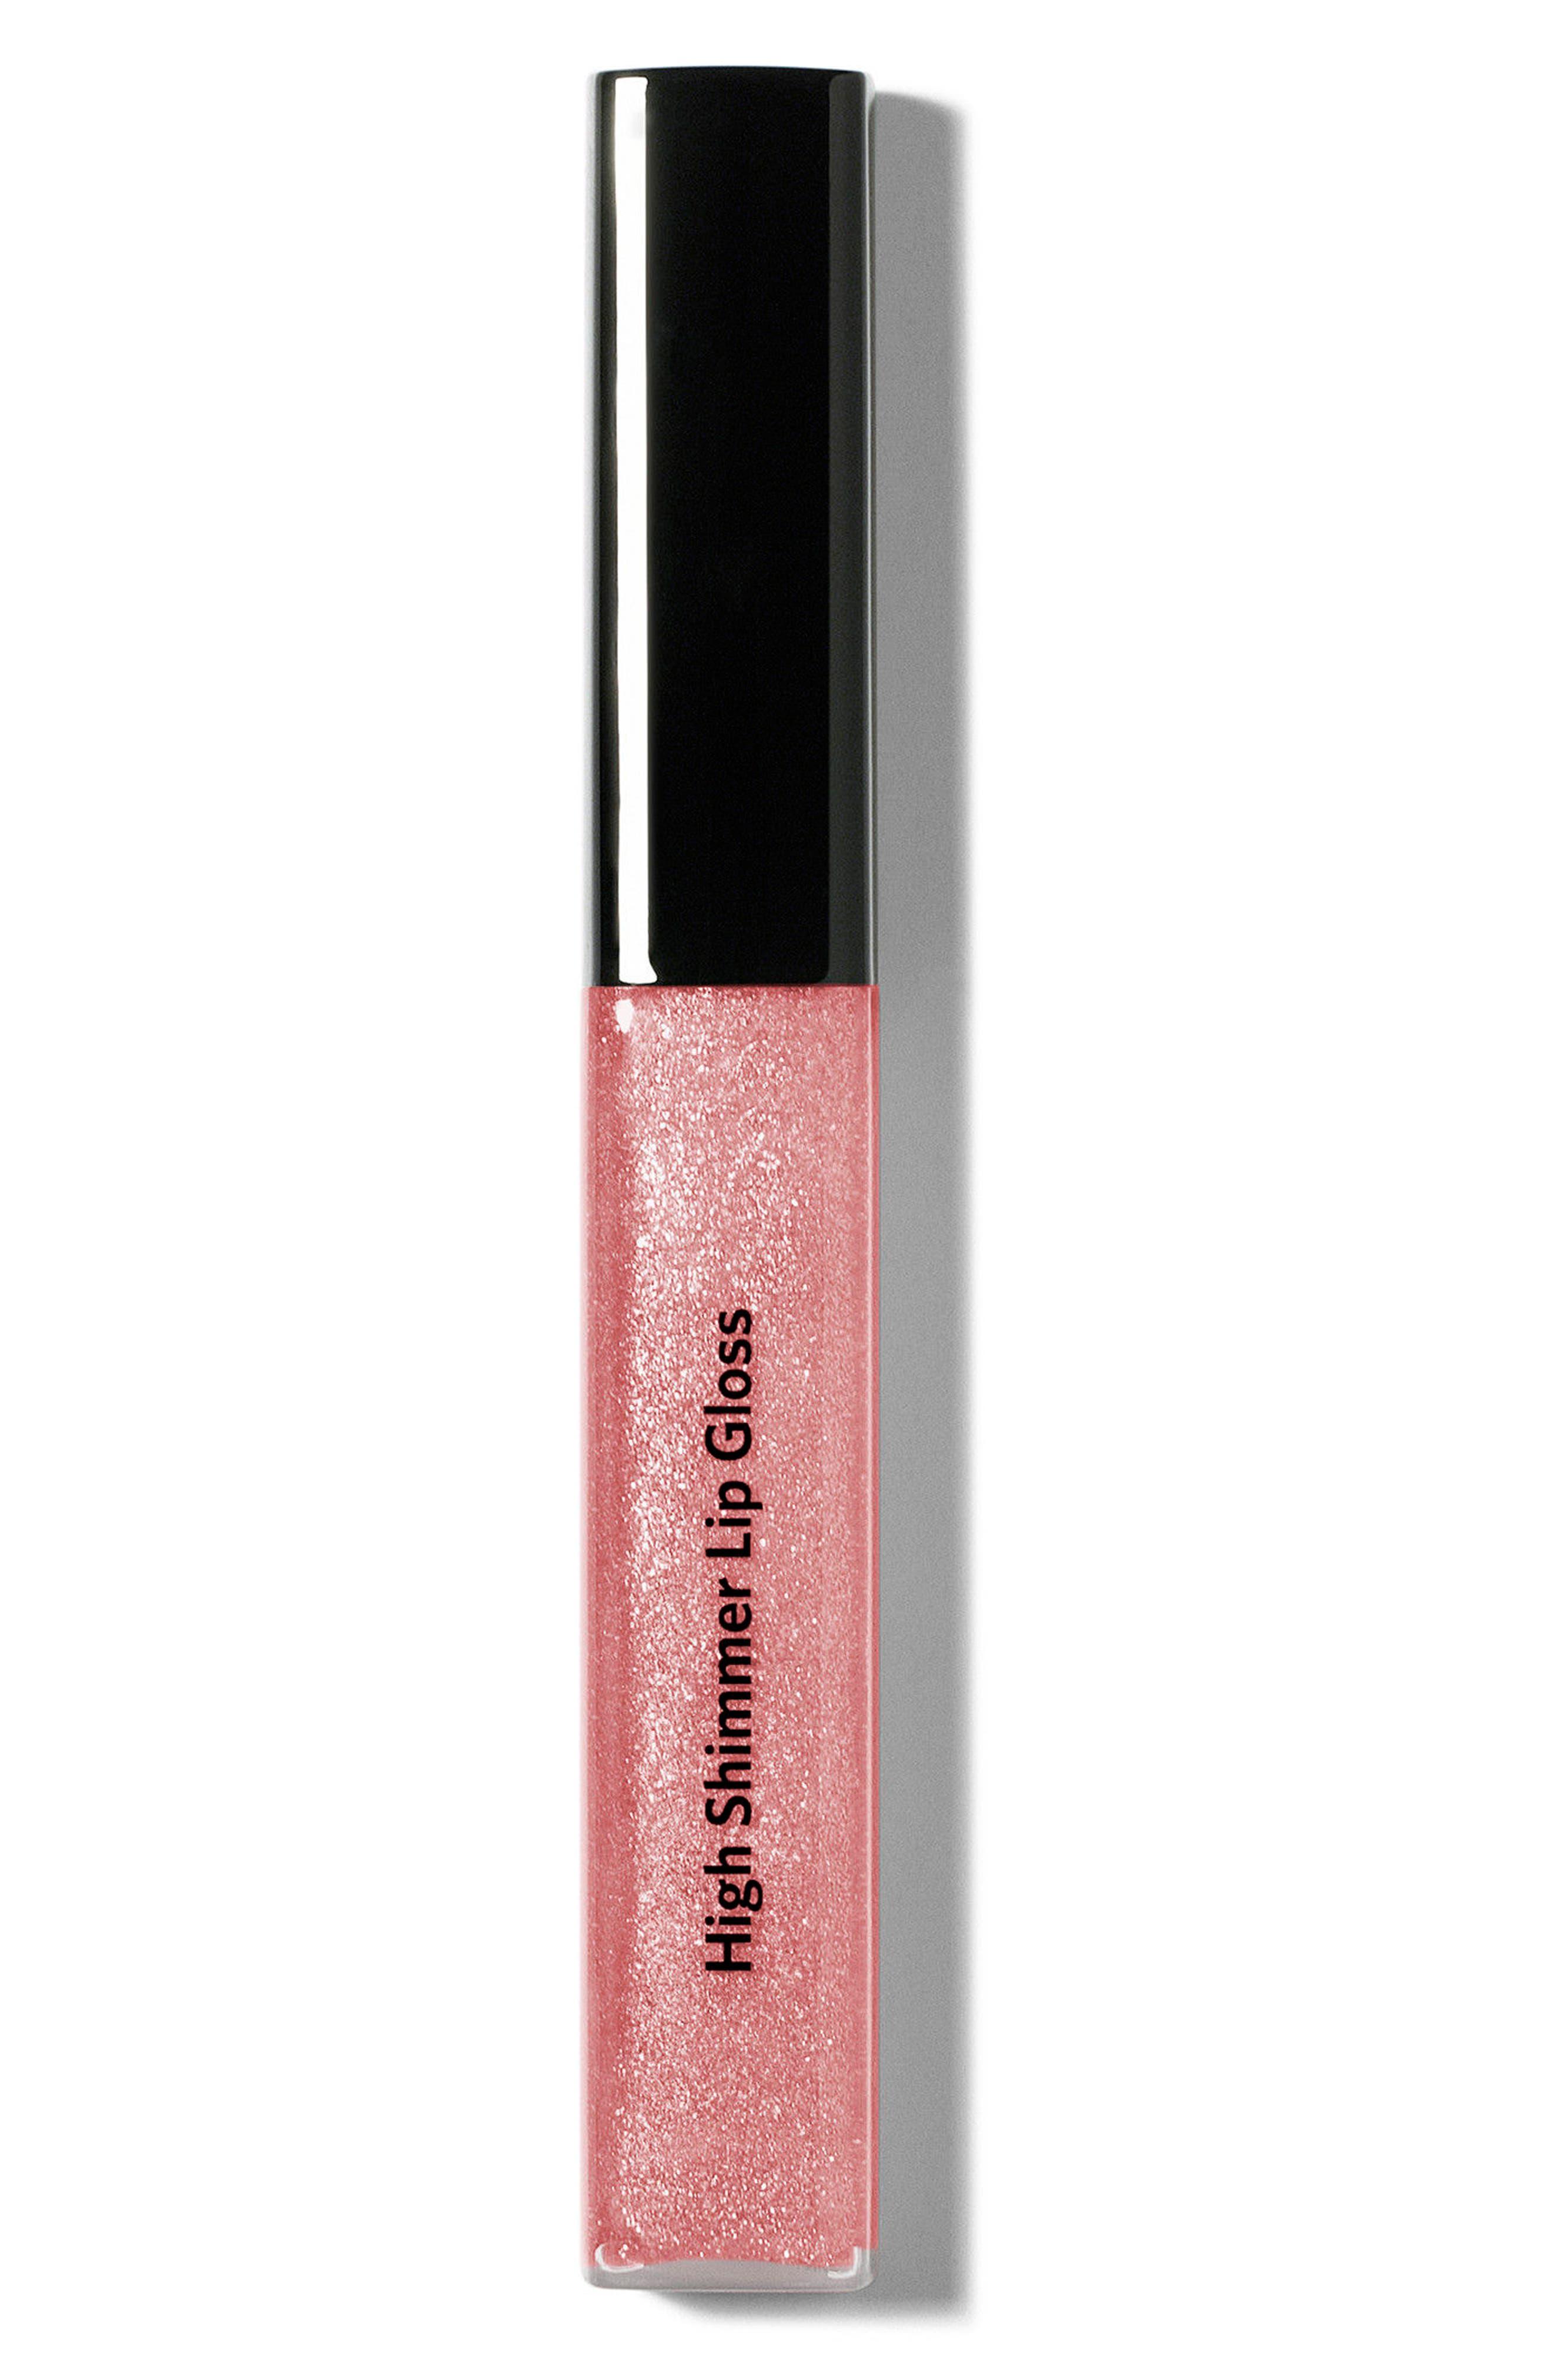 Metallic Lipstick Lip Gloss Color Nordstrom Torch Tshirt Women Pink Fuchsia L